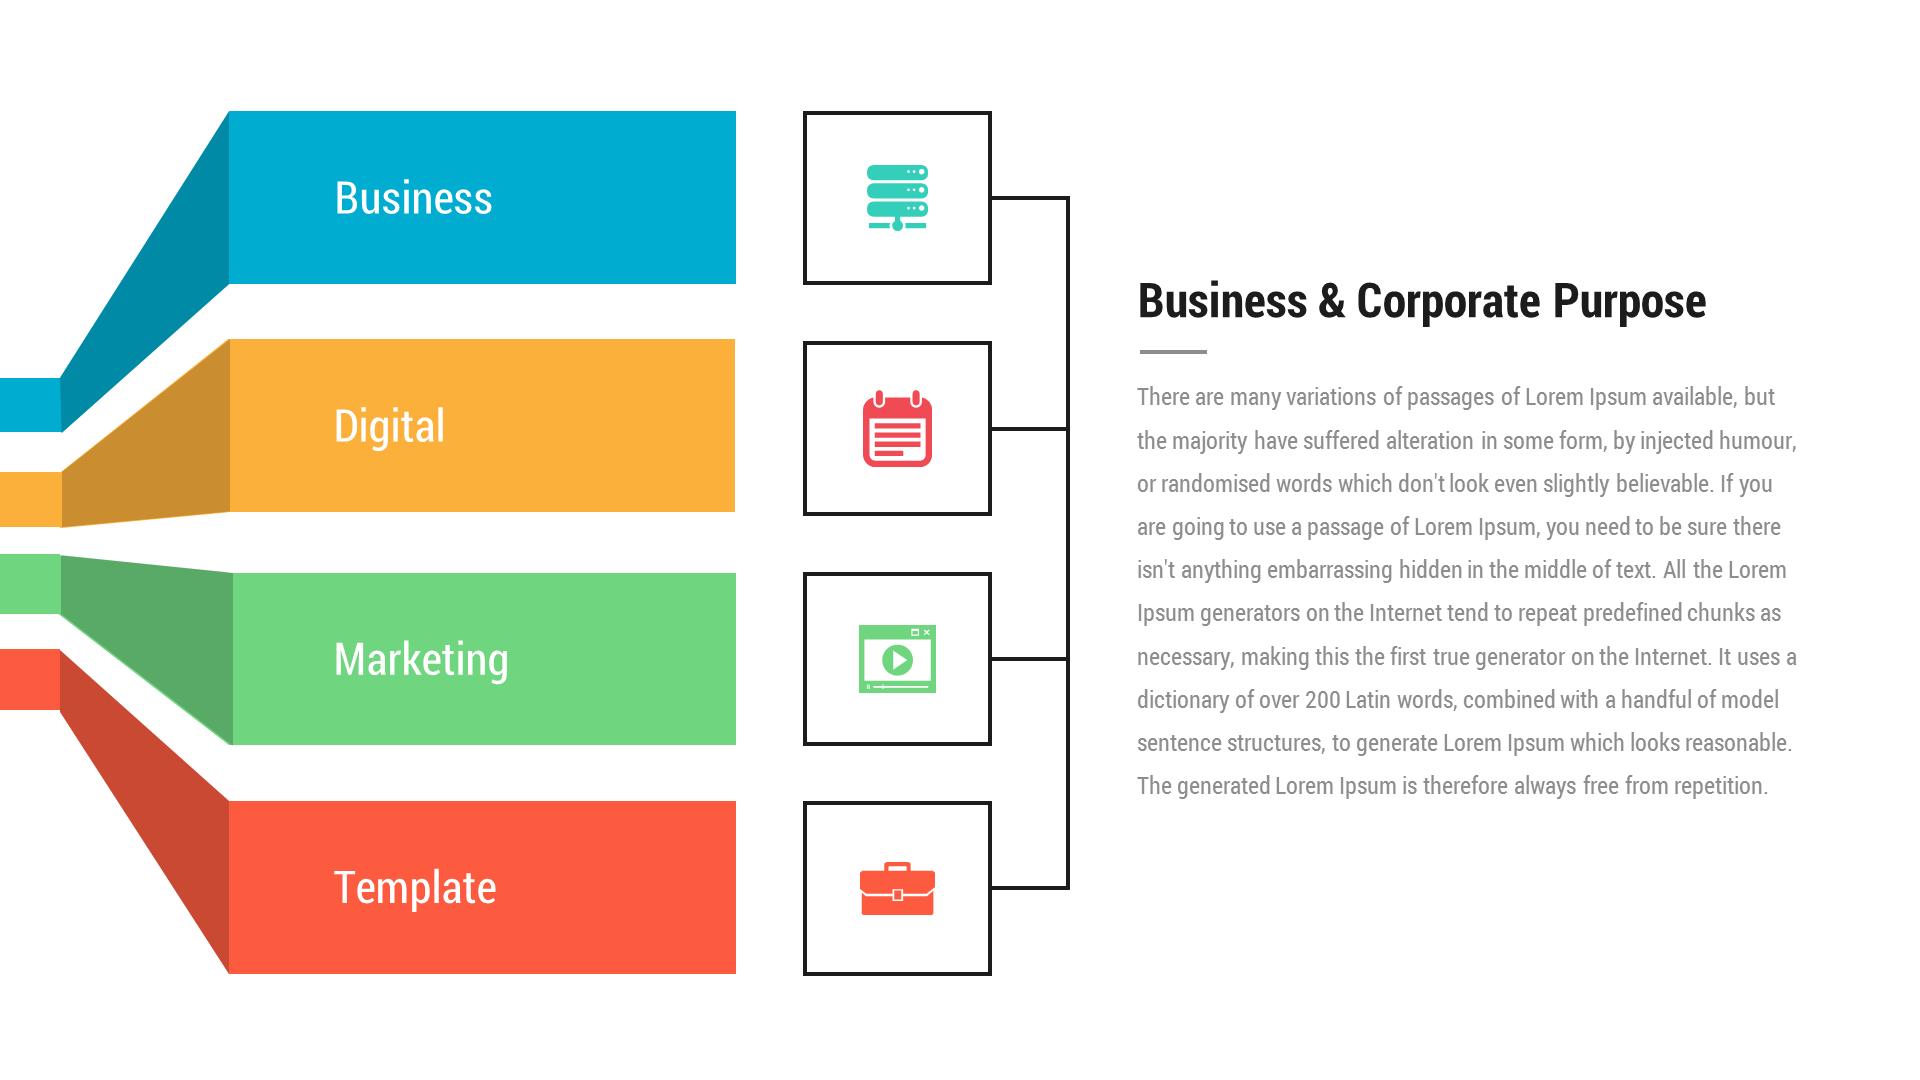 Business Ideas - New Trending Template #Business #Ideas #Powerpoint #Template #Ppt #Slides http://goo.gl/QiW2KQ